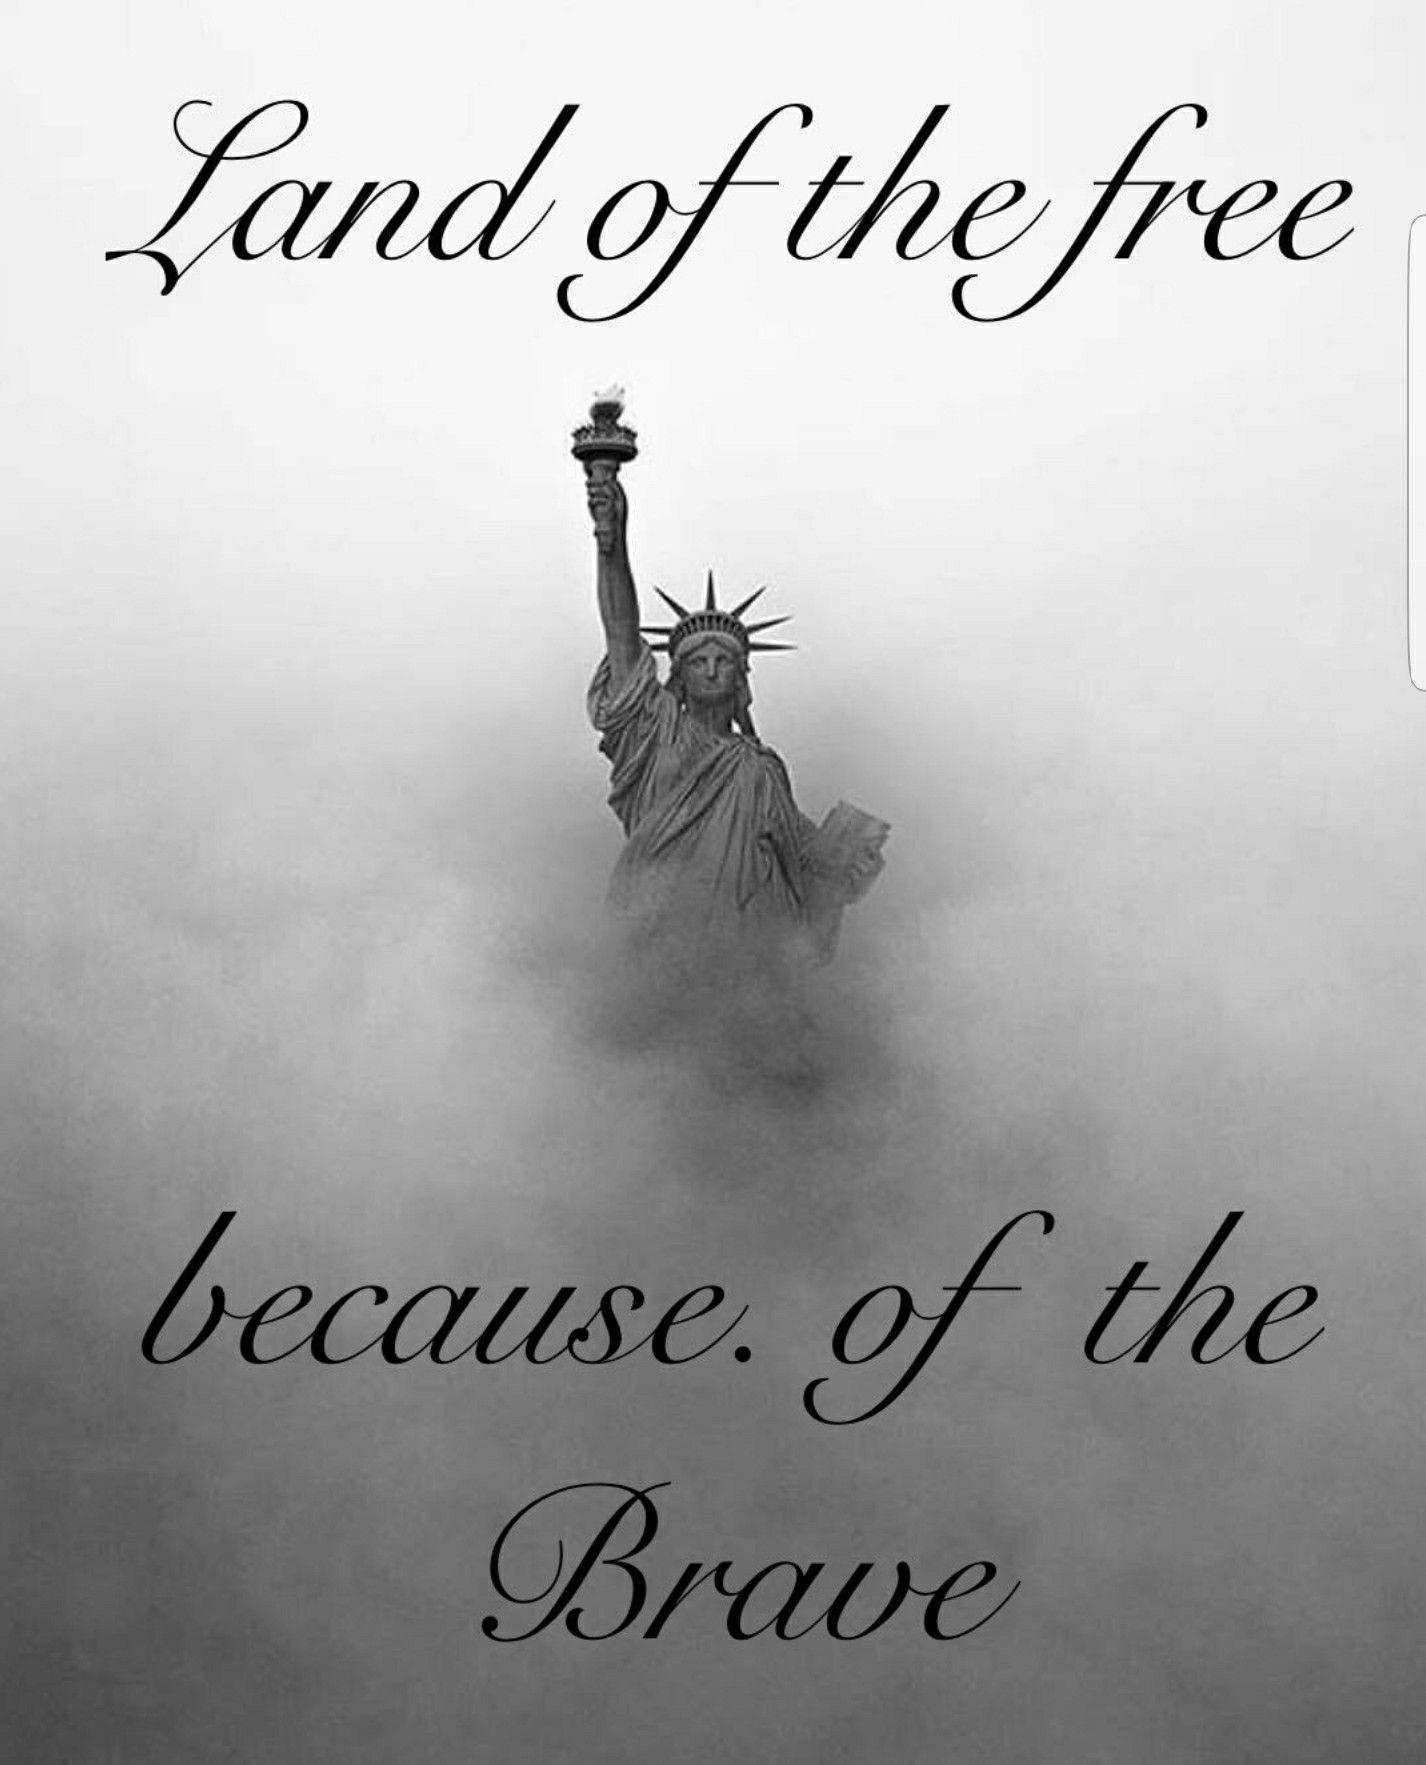 Patriotic Quotes: Pin By Kingdom Of Lucifer On Patriots / Patriotism / Heroes